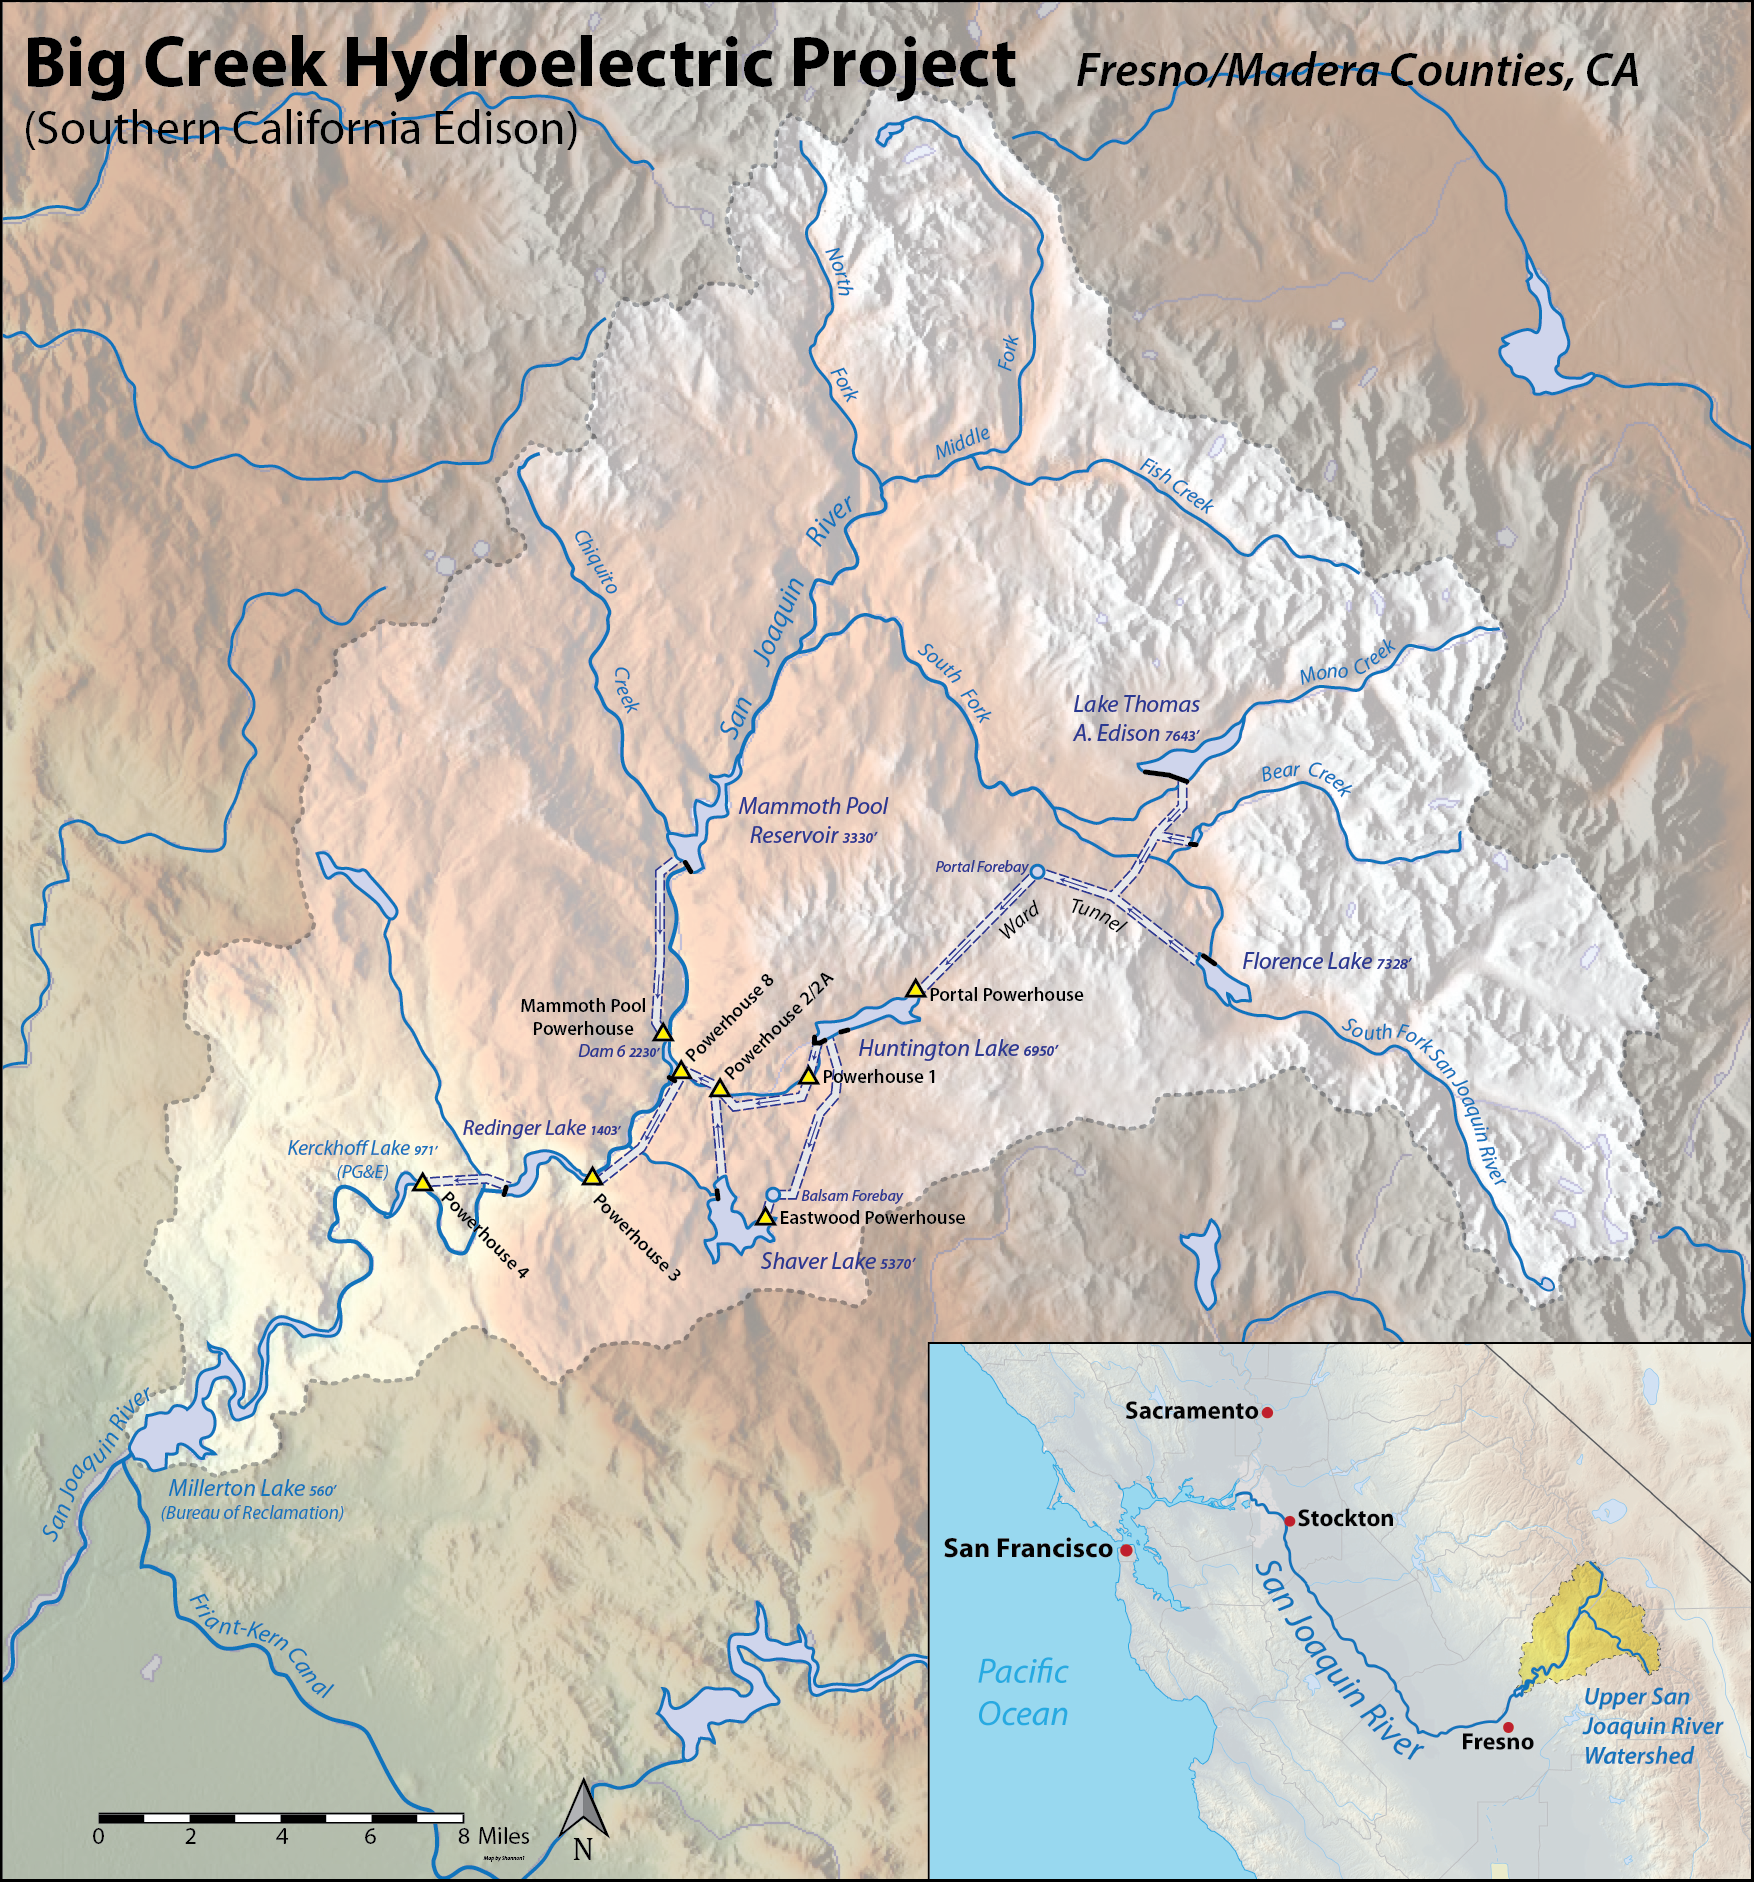 Big Creek Hydroelectric Project Wikipedia